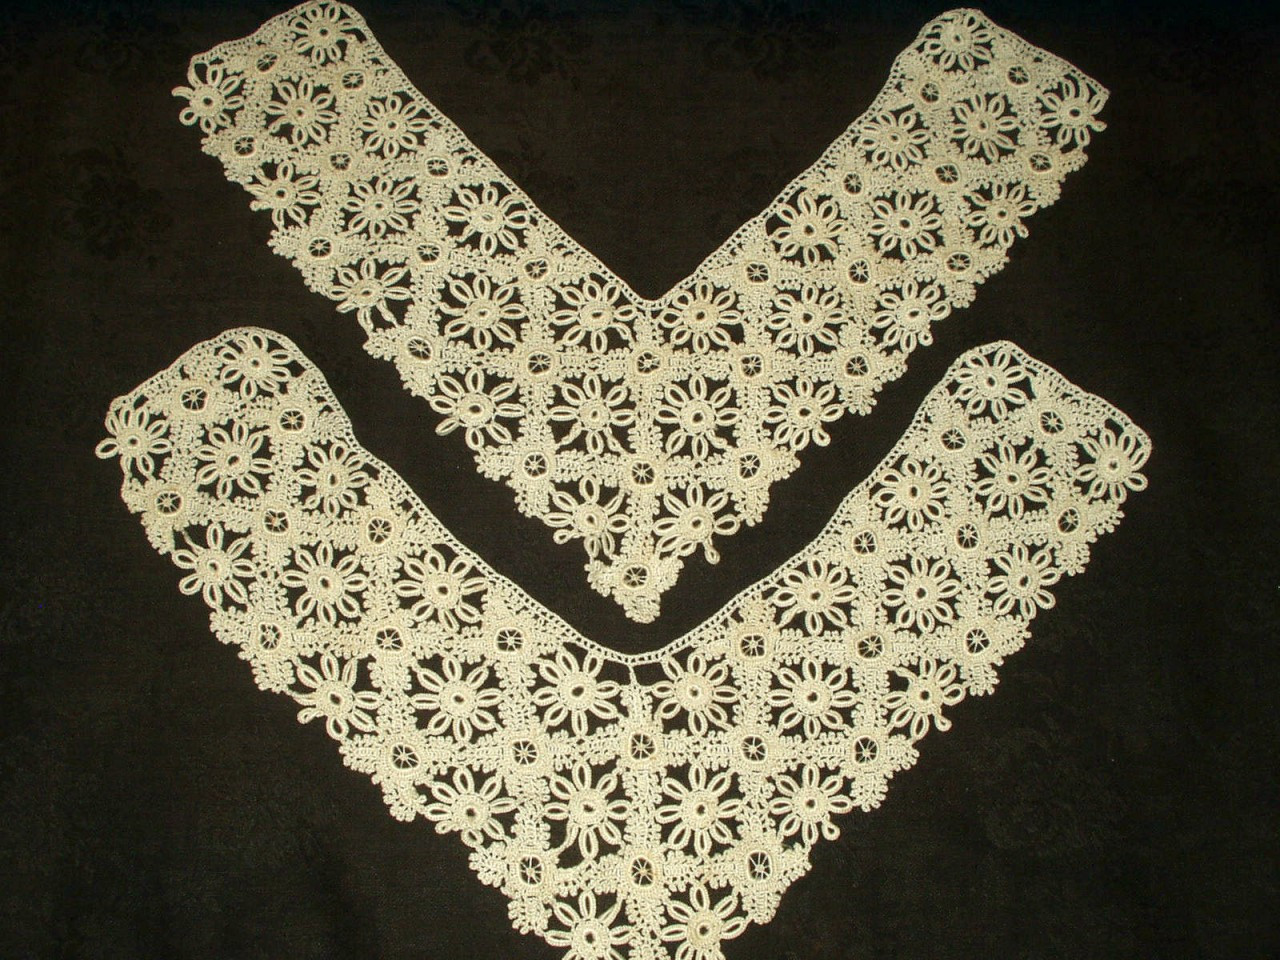 2 Vintage Hand Tatted Tablecloth Corner Inset Trim Embellishment